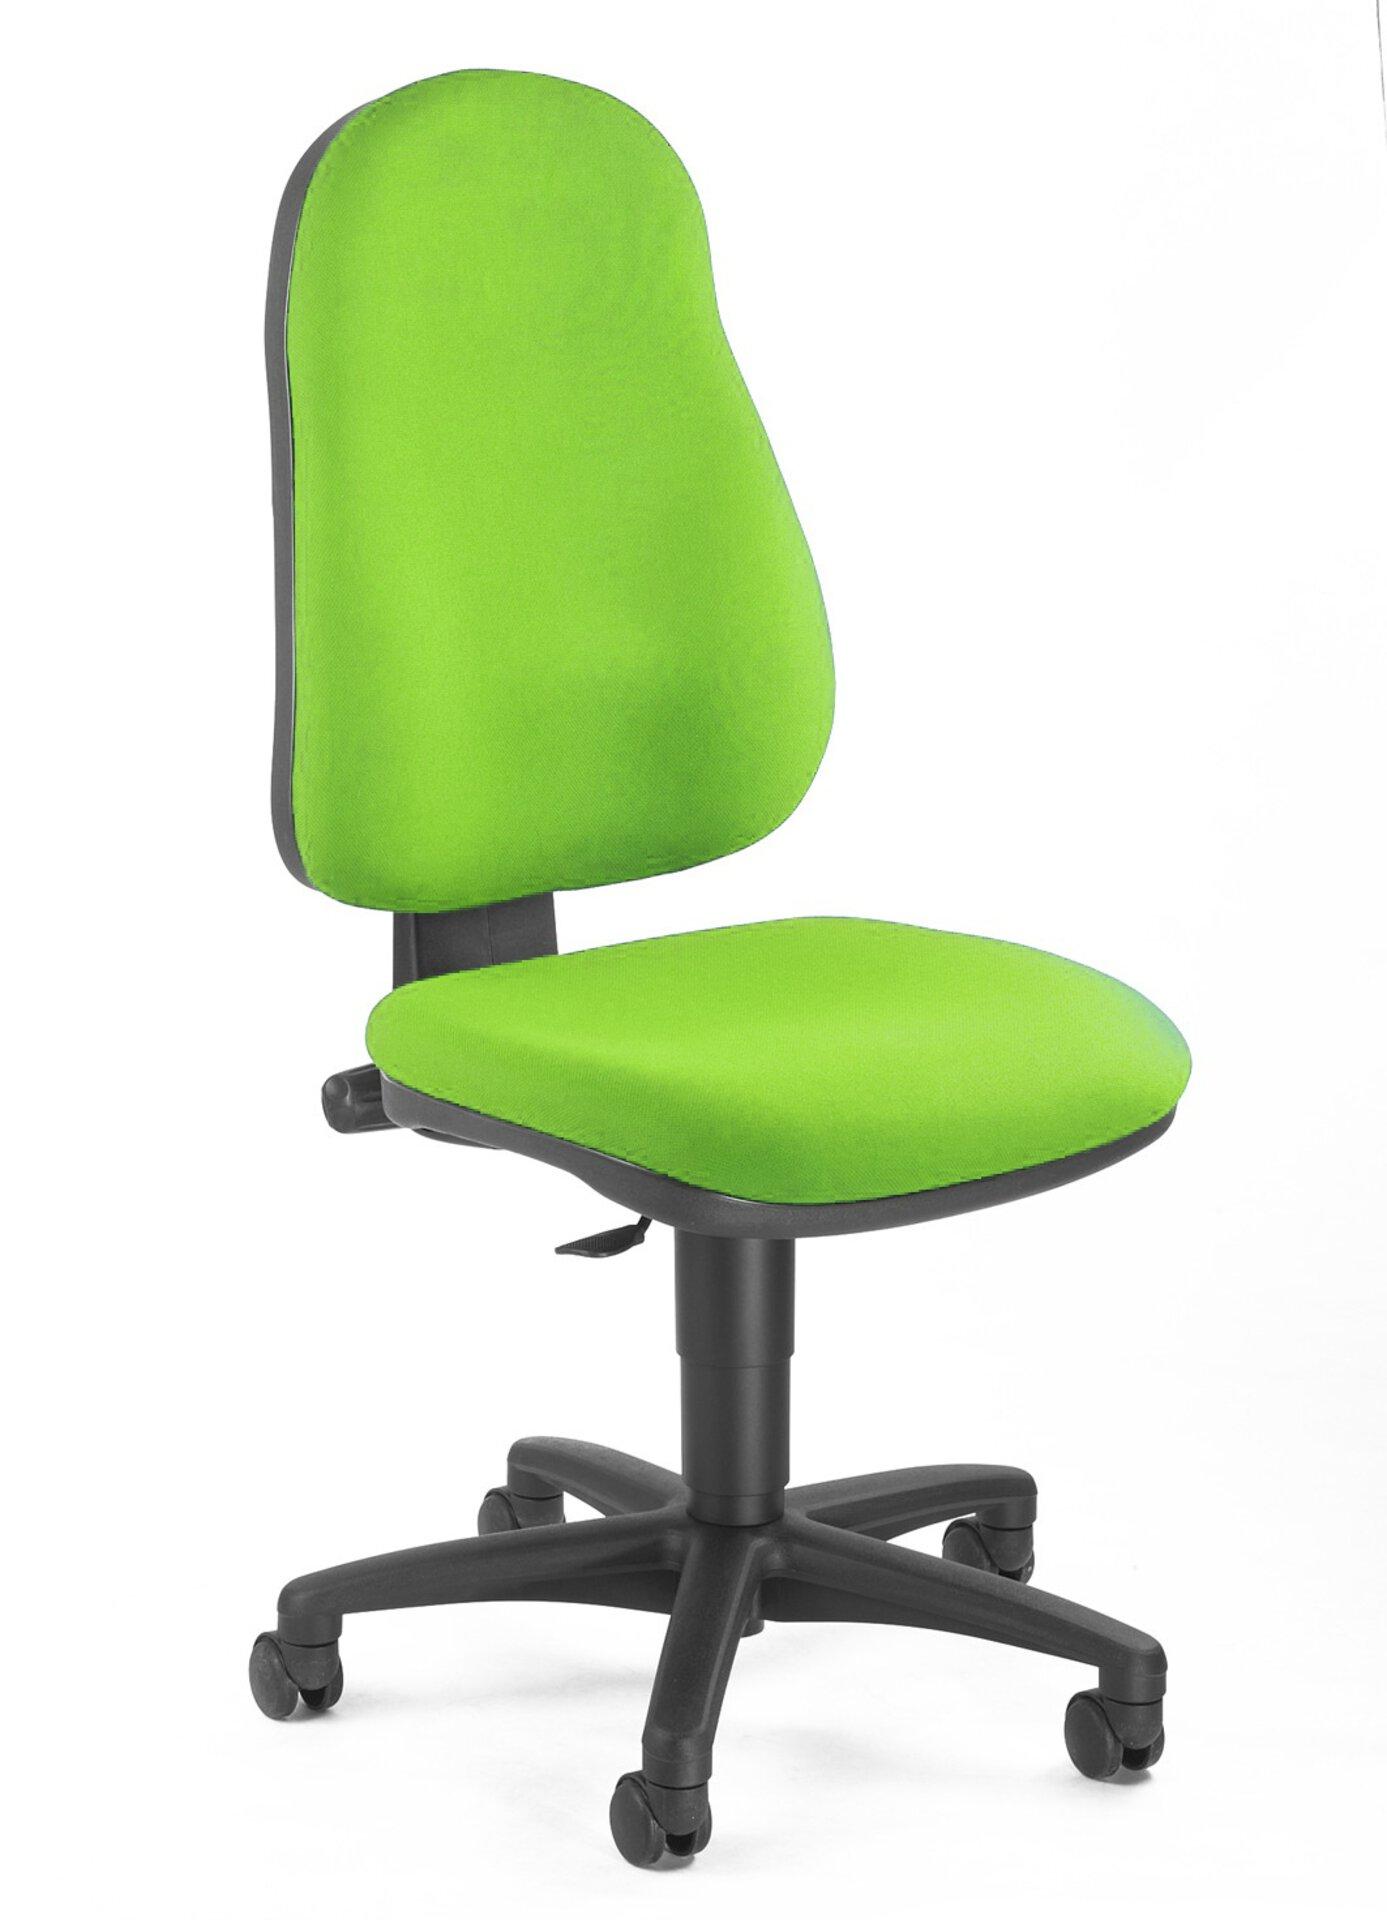 Büro-Drehstuhl POINT 50 Topstar Textil grün 46 x 110 x 45 cm